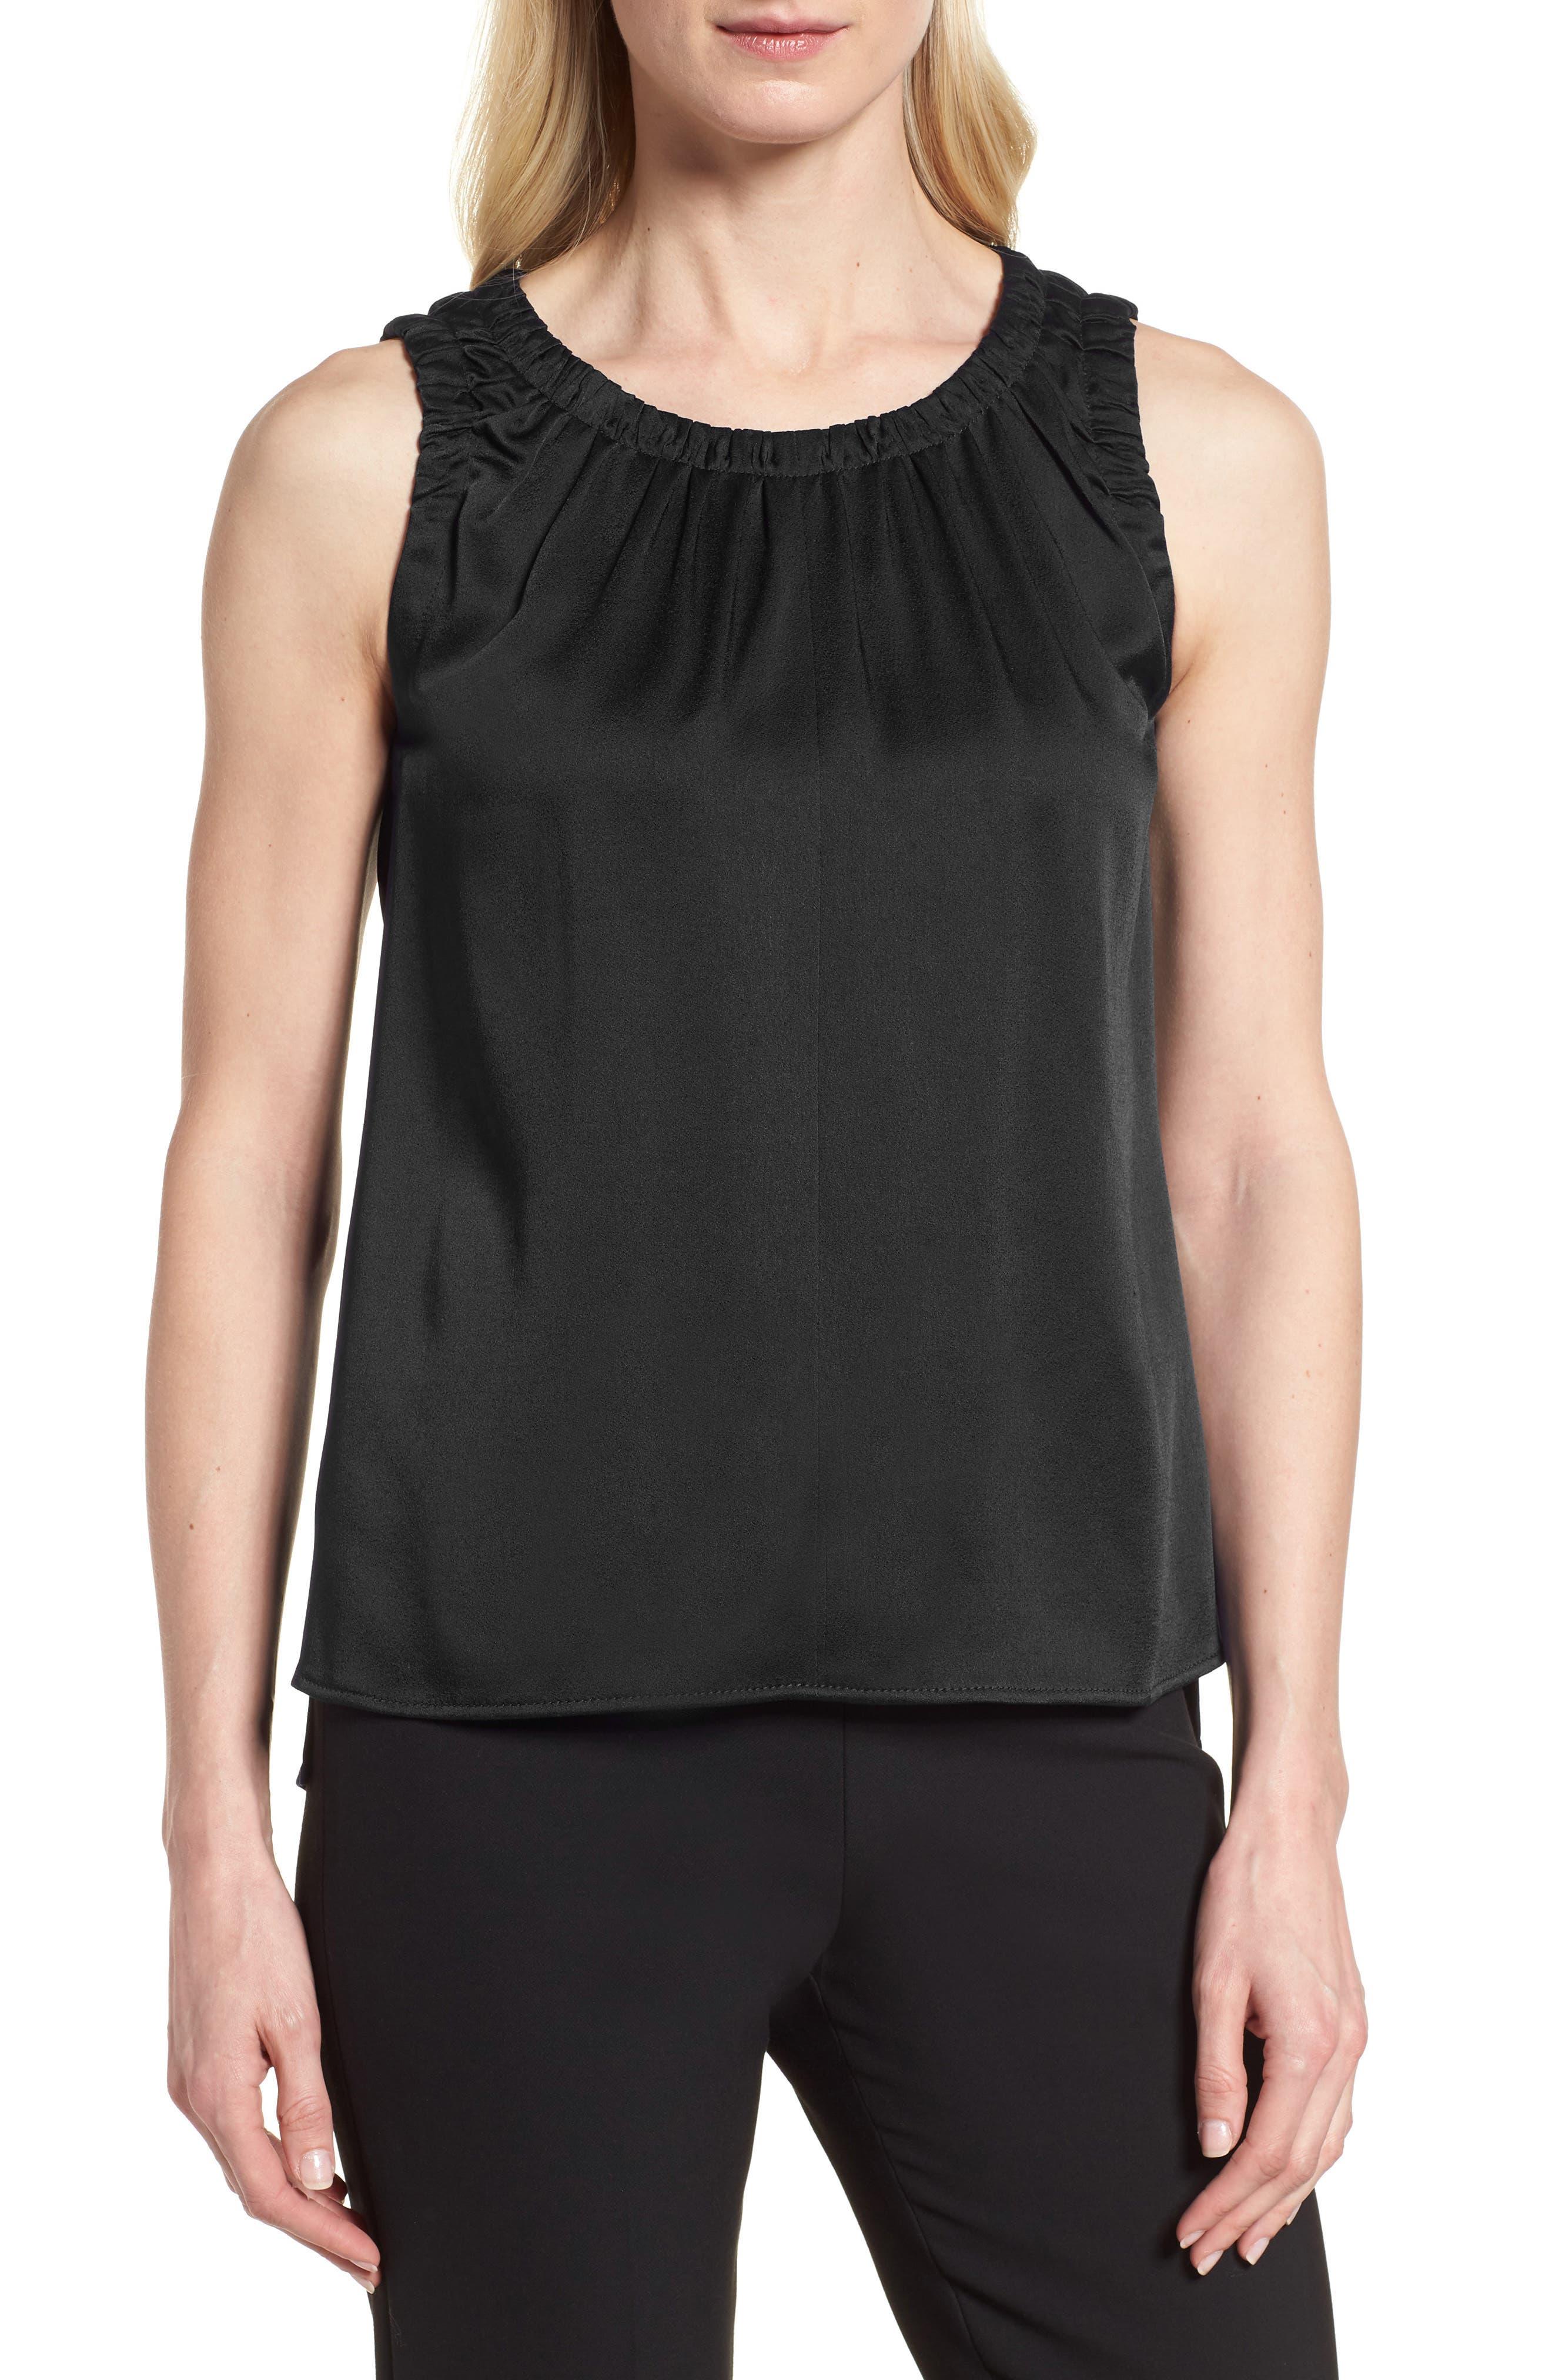 Ivanica Top,                         Main,                         color, Black